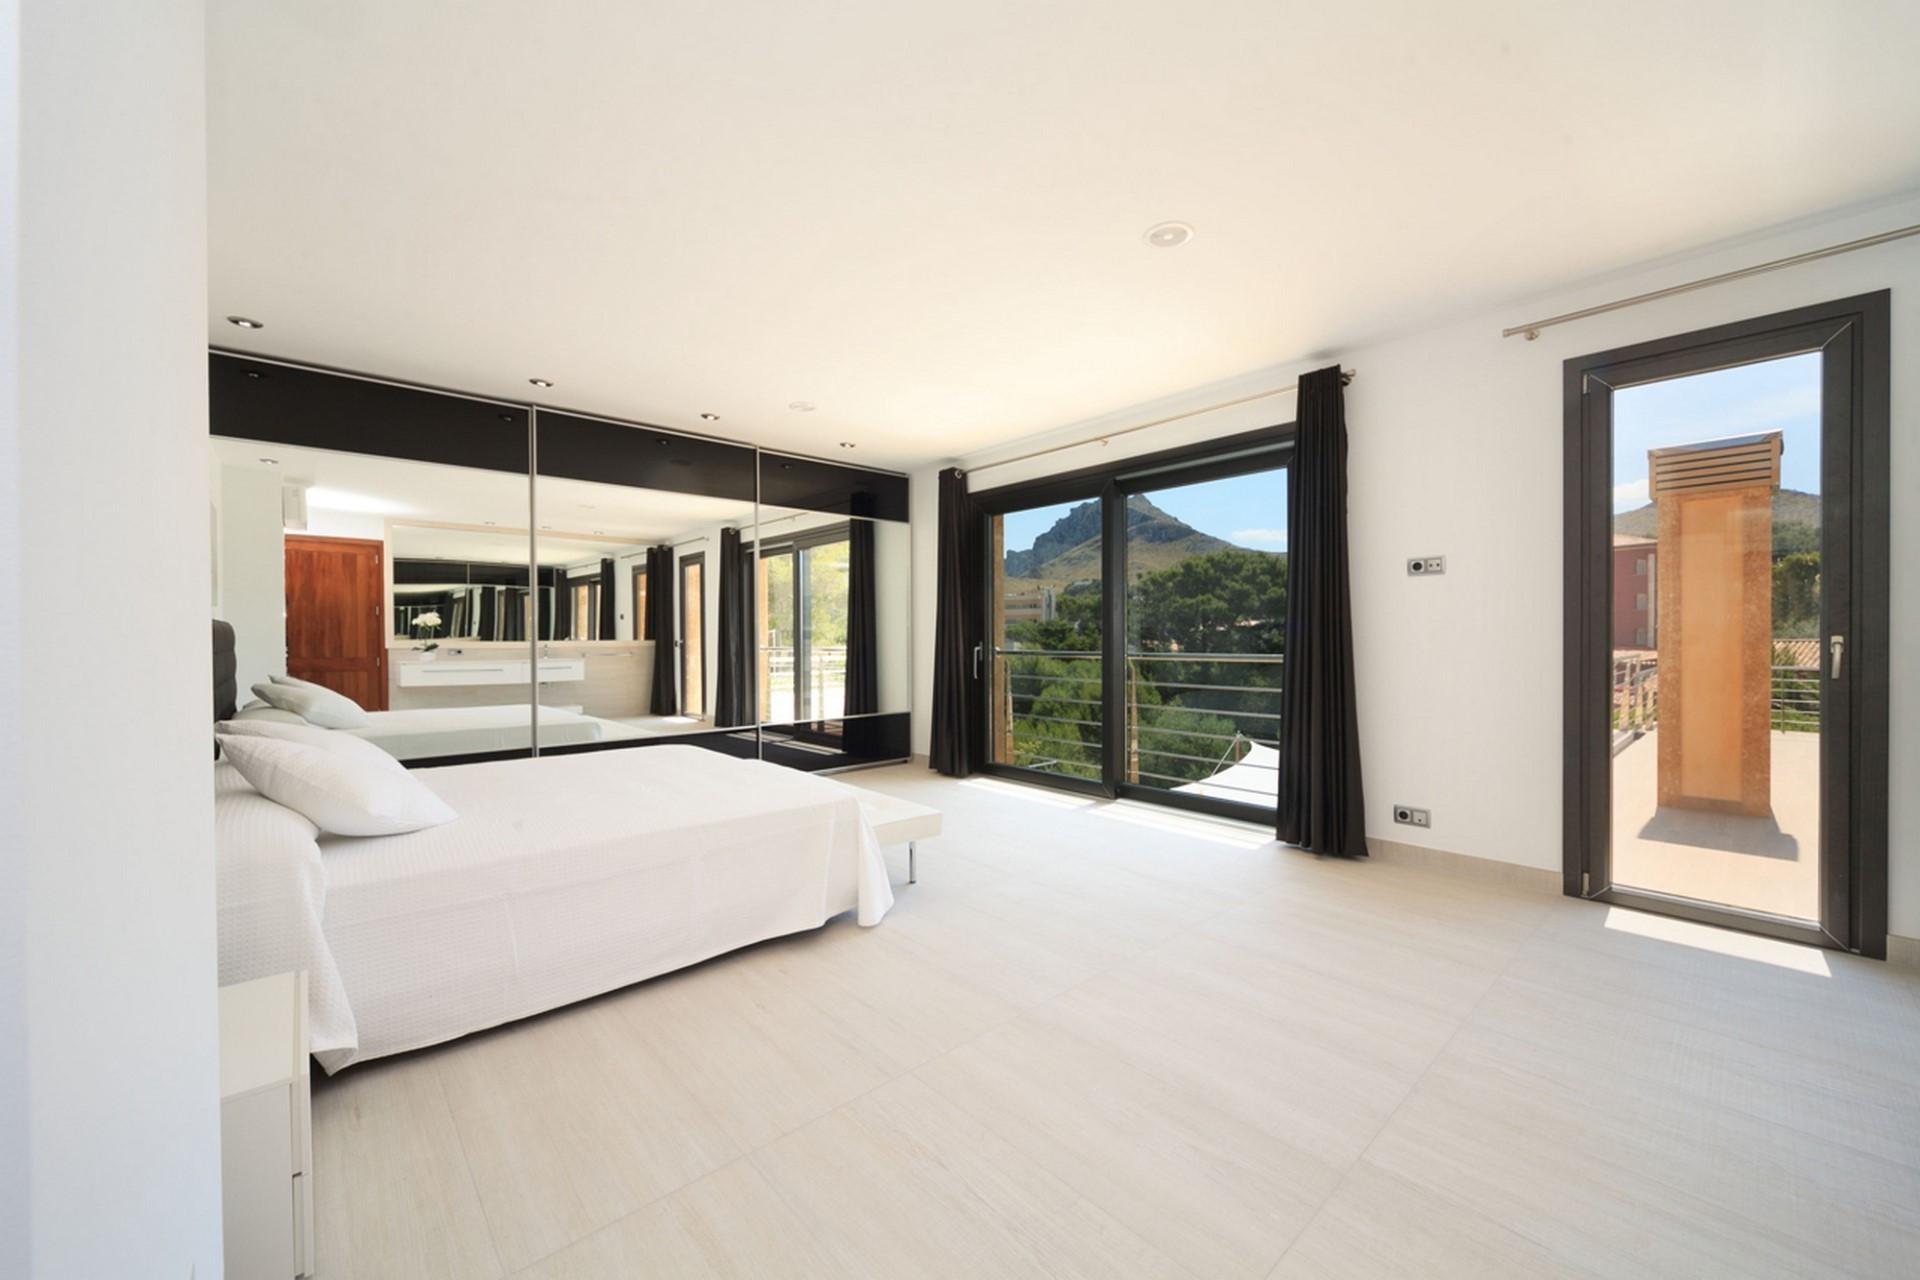 Luxury 4 Bedroom Villa Cala Sant Vinec Villa With Private Pool & Jacuzzi